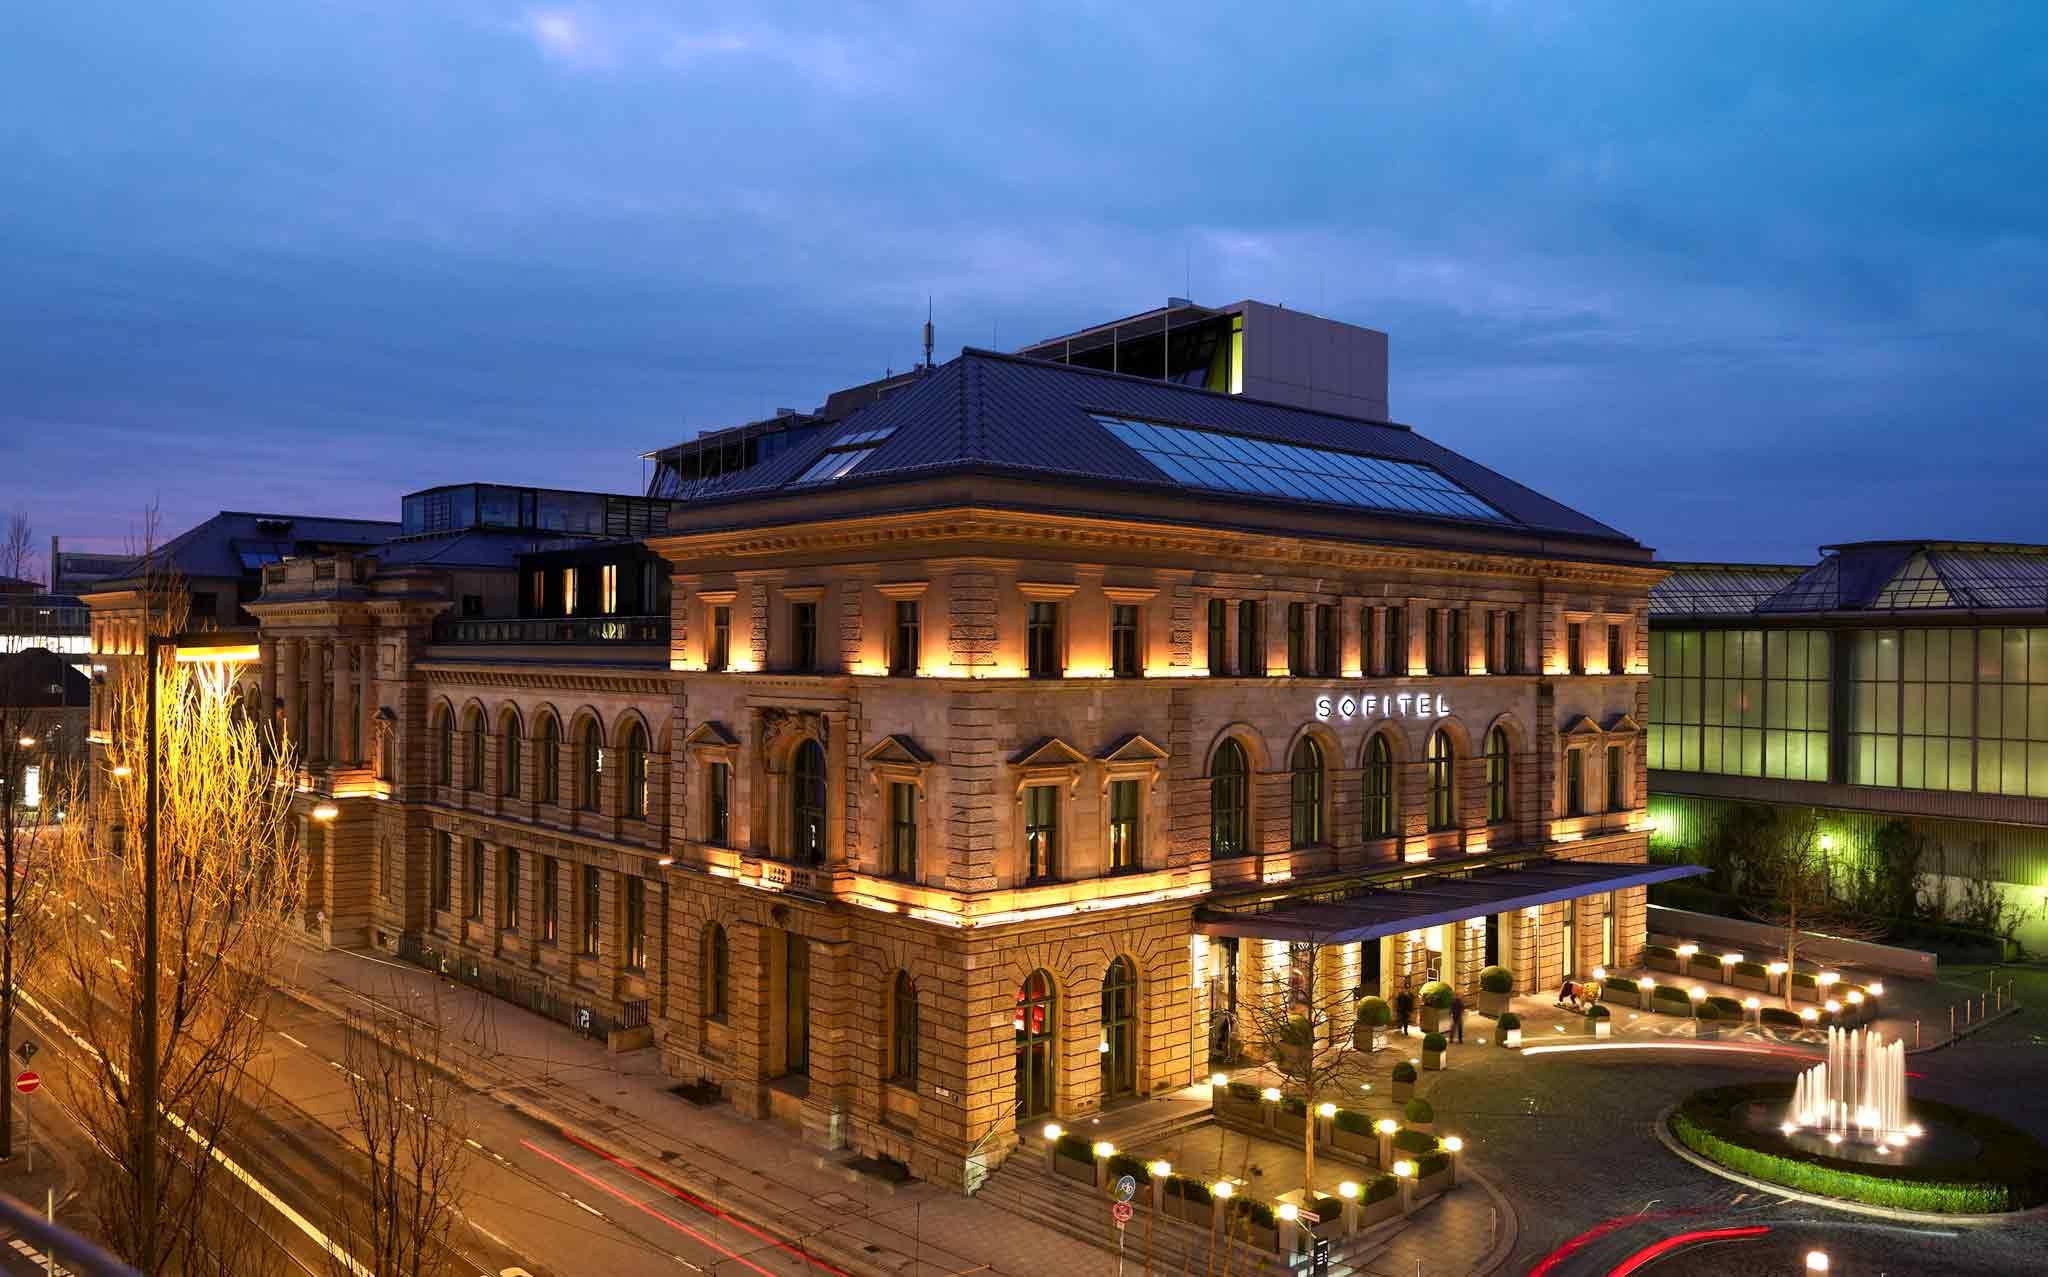 Hotel – Sofitel München Bayerpost